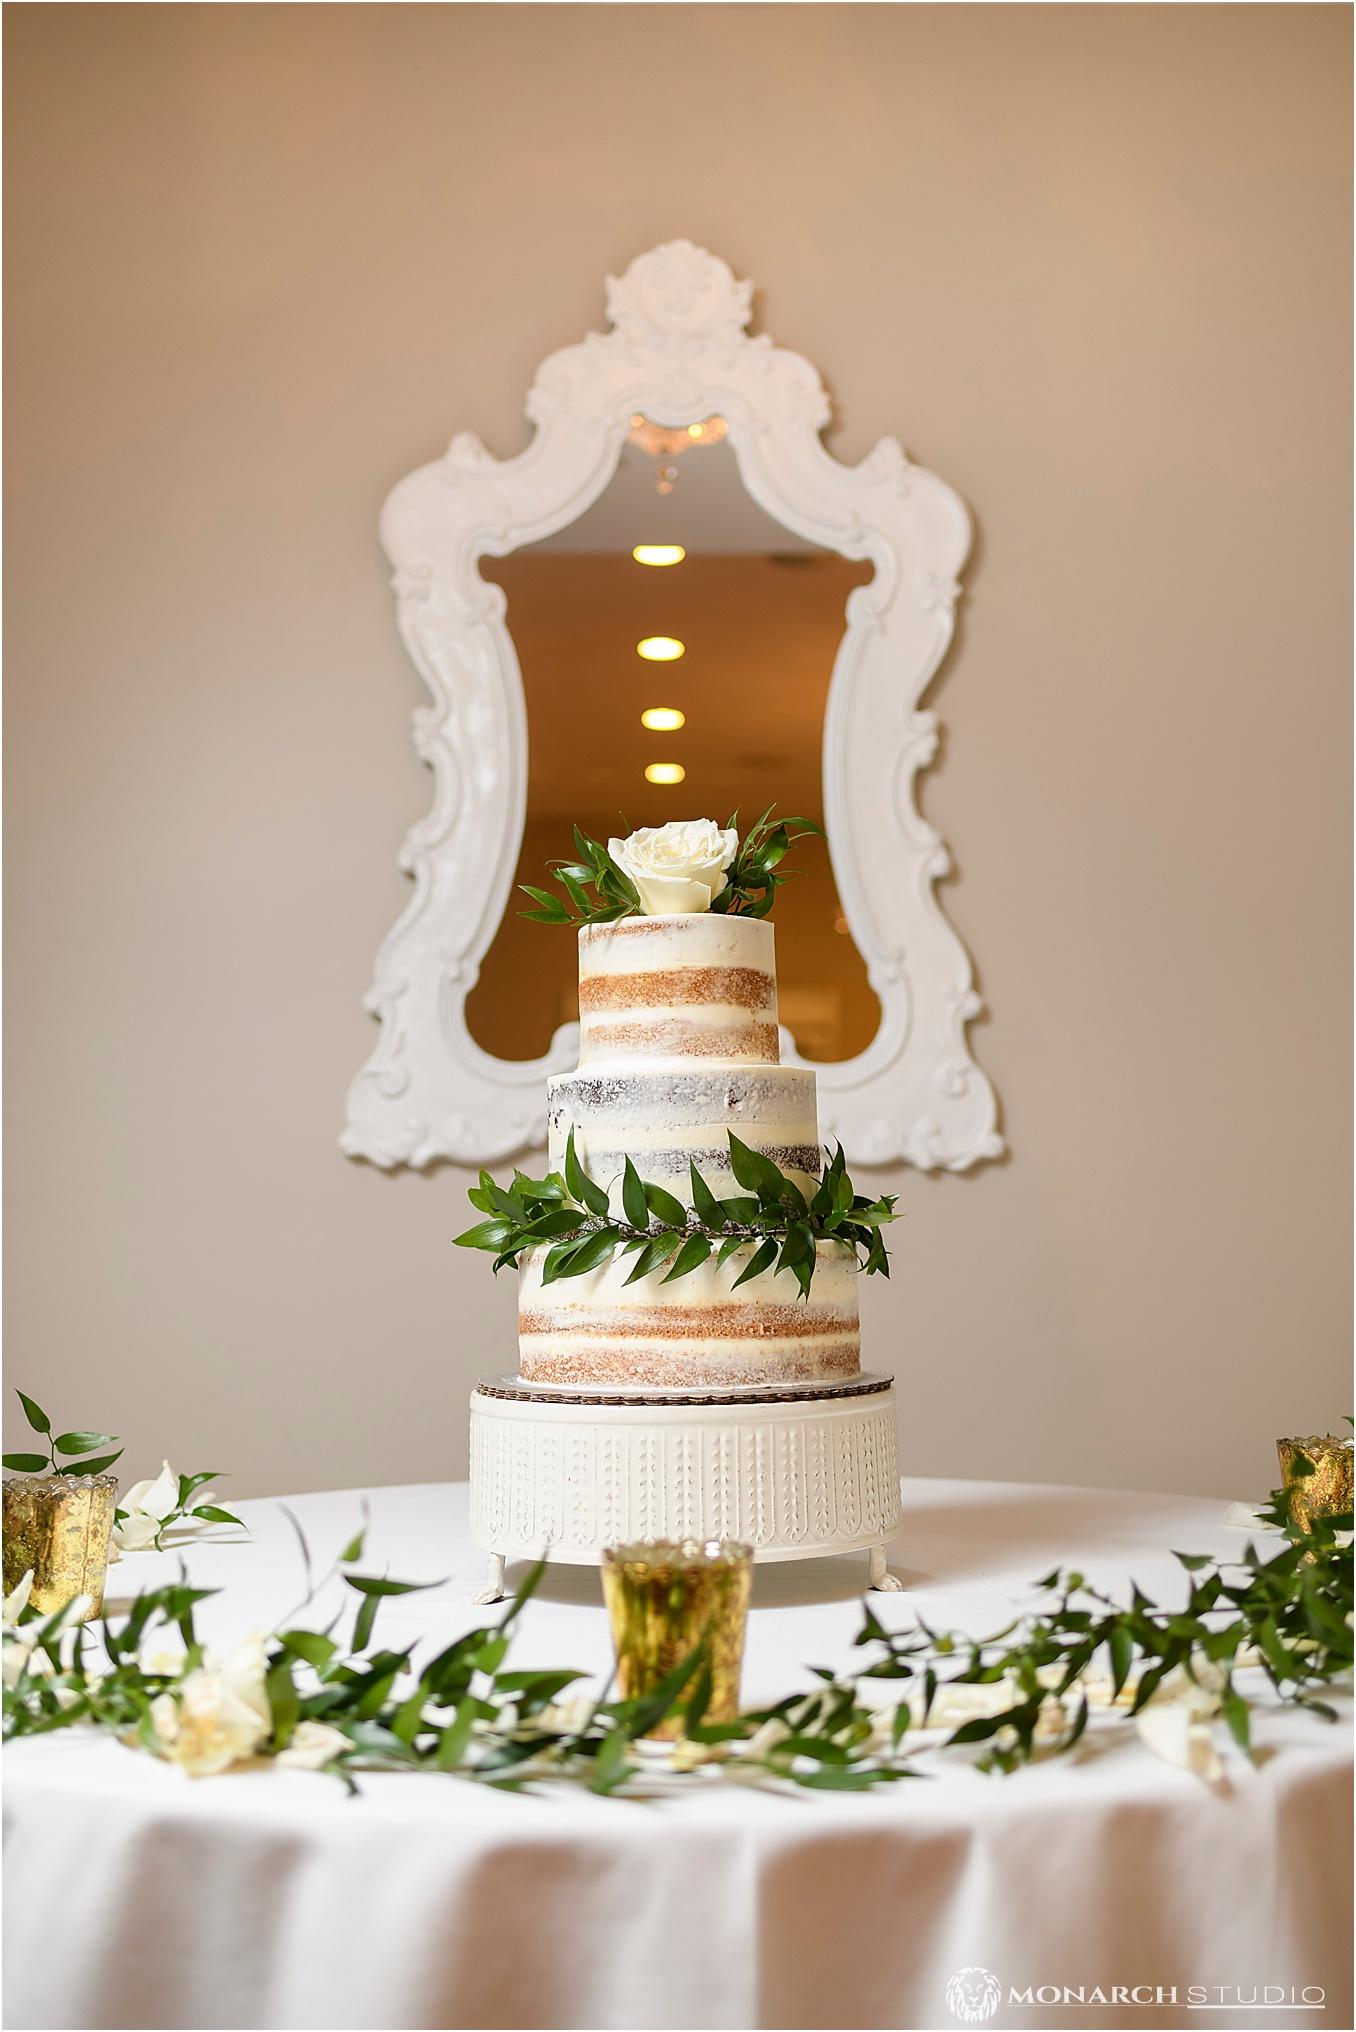 059-whiteroom-wedding-photographer-2019-05-22_0041.jpg